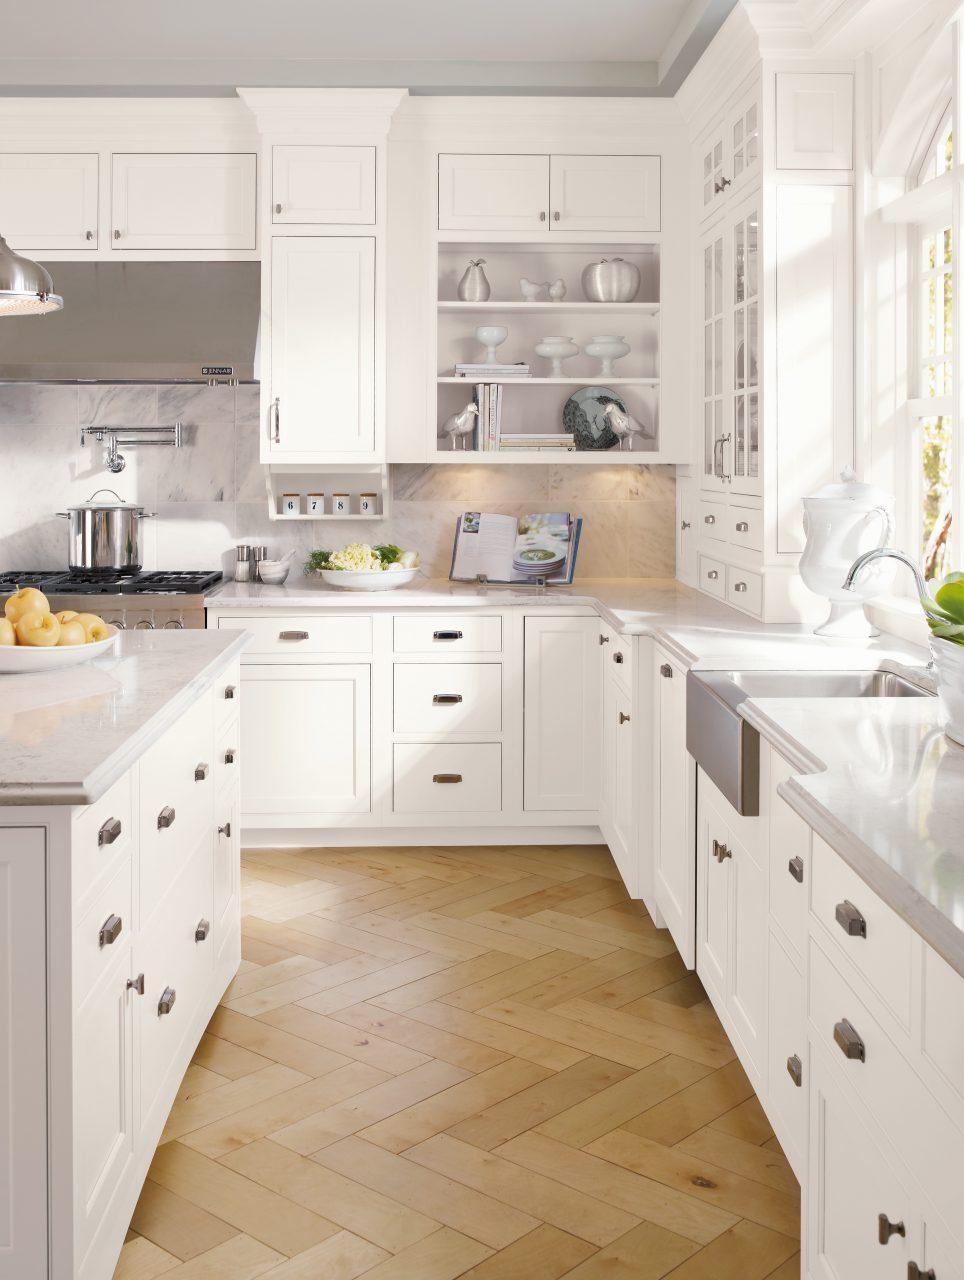 trademarkinteriors nj kitchen cabinets White Custom Kitchen Cabinets in New Jersey